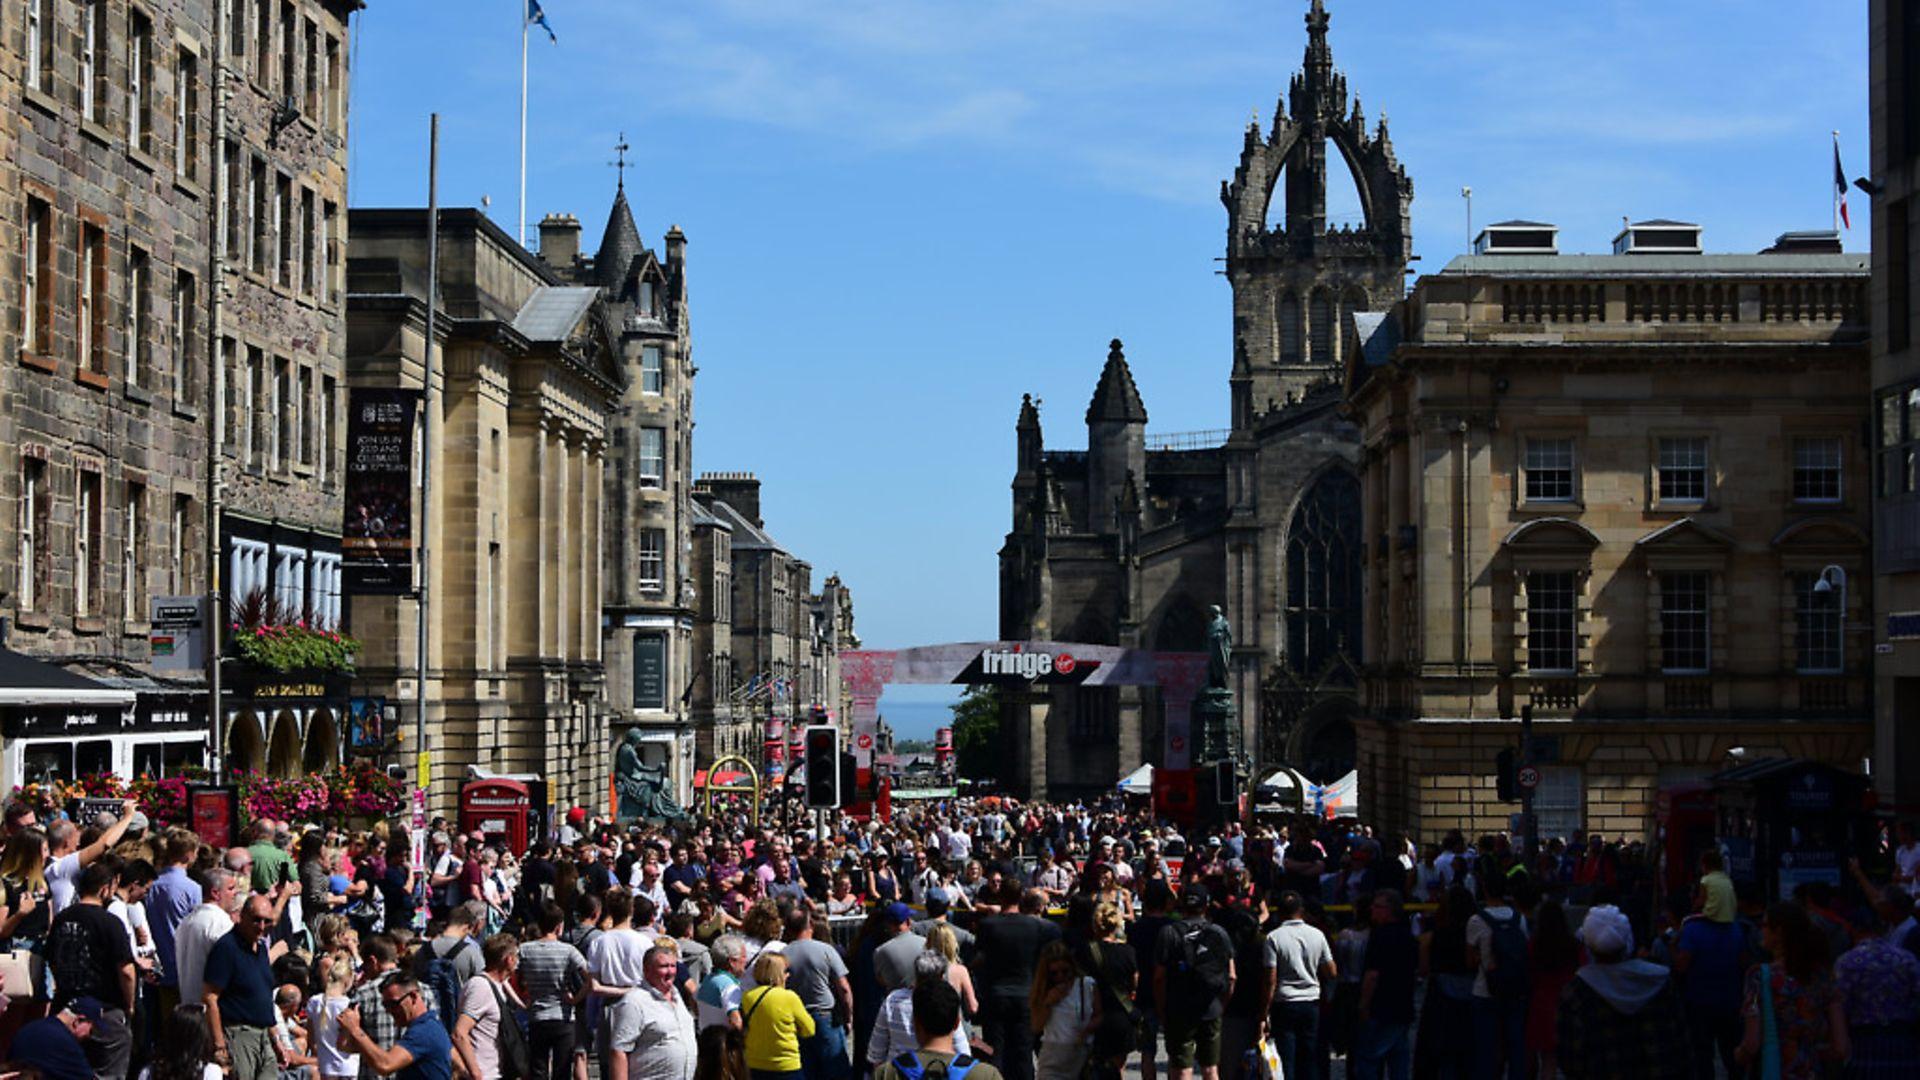 Festival-goers line the Royal Mile at the Edinburgh Festival Fringe. Picture: Ken Jack/Getty Images - Credit: Getty Images